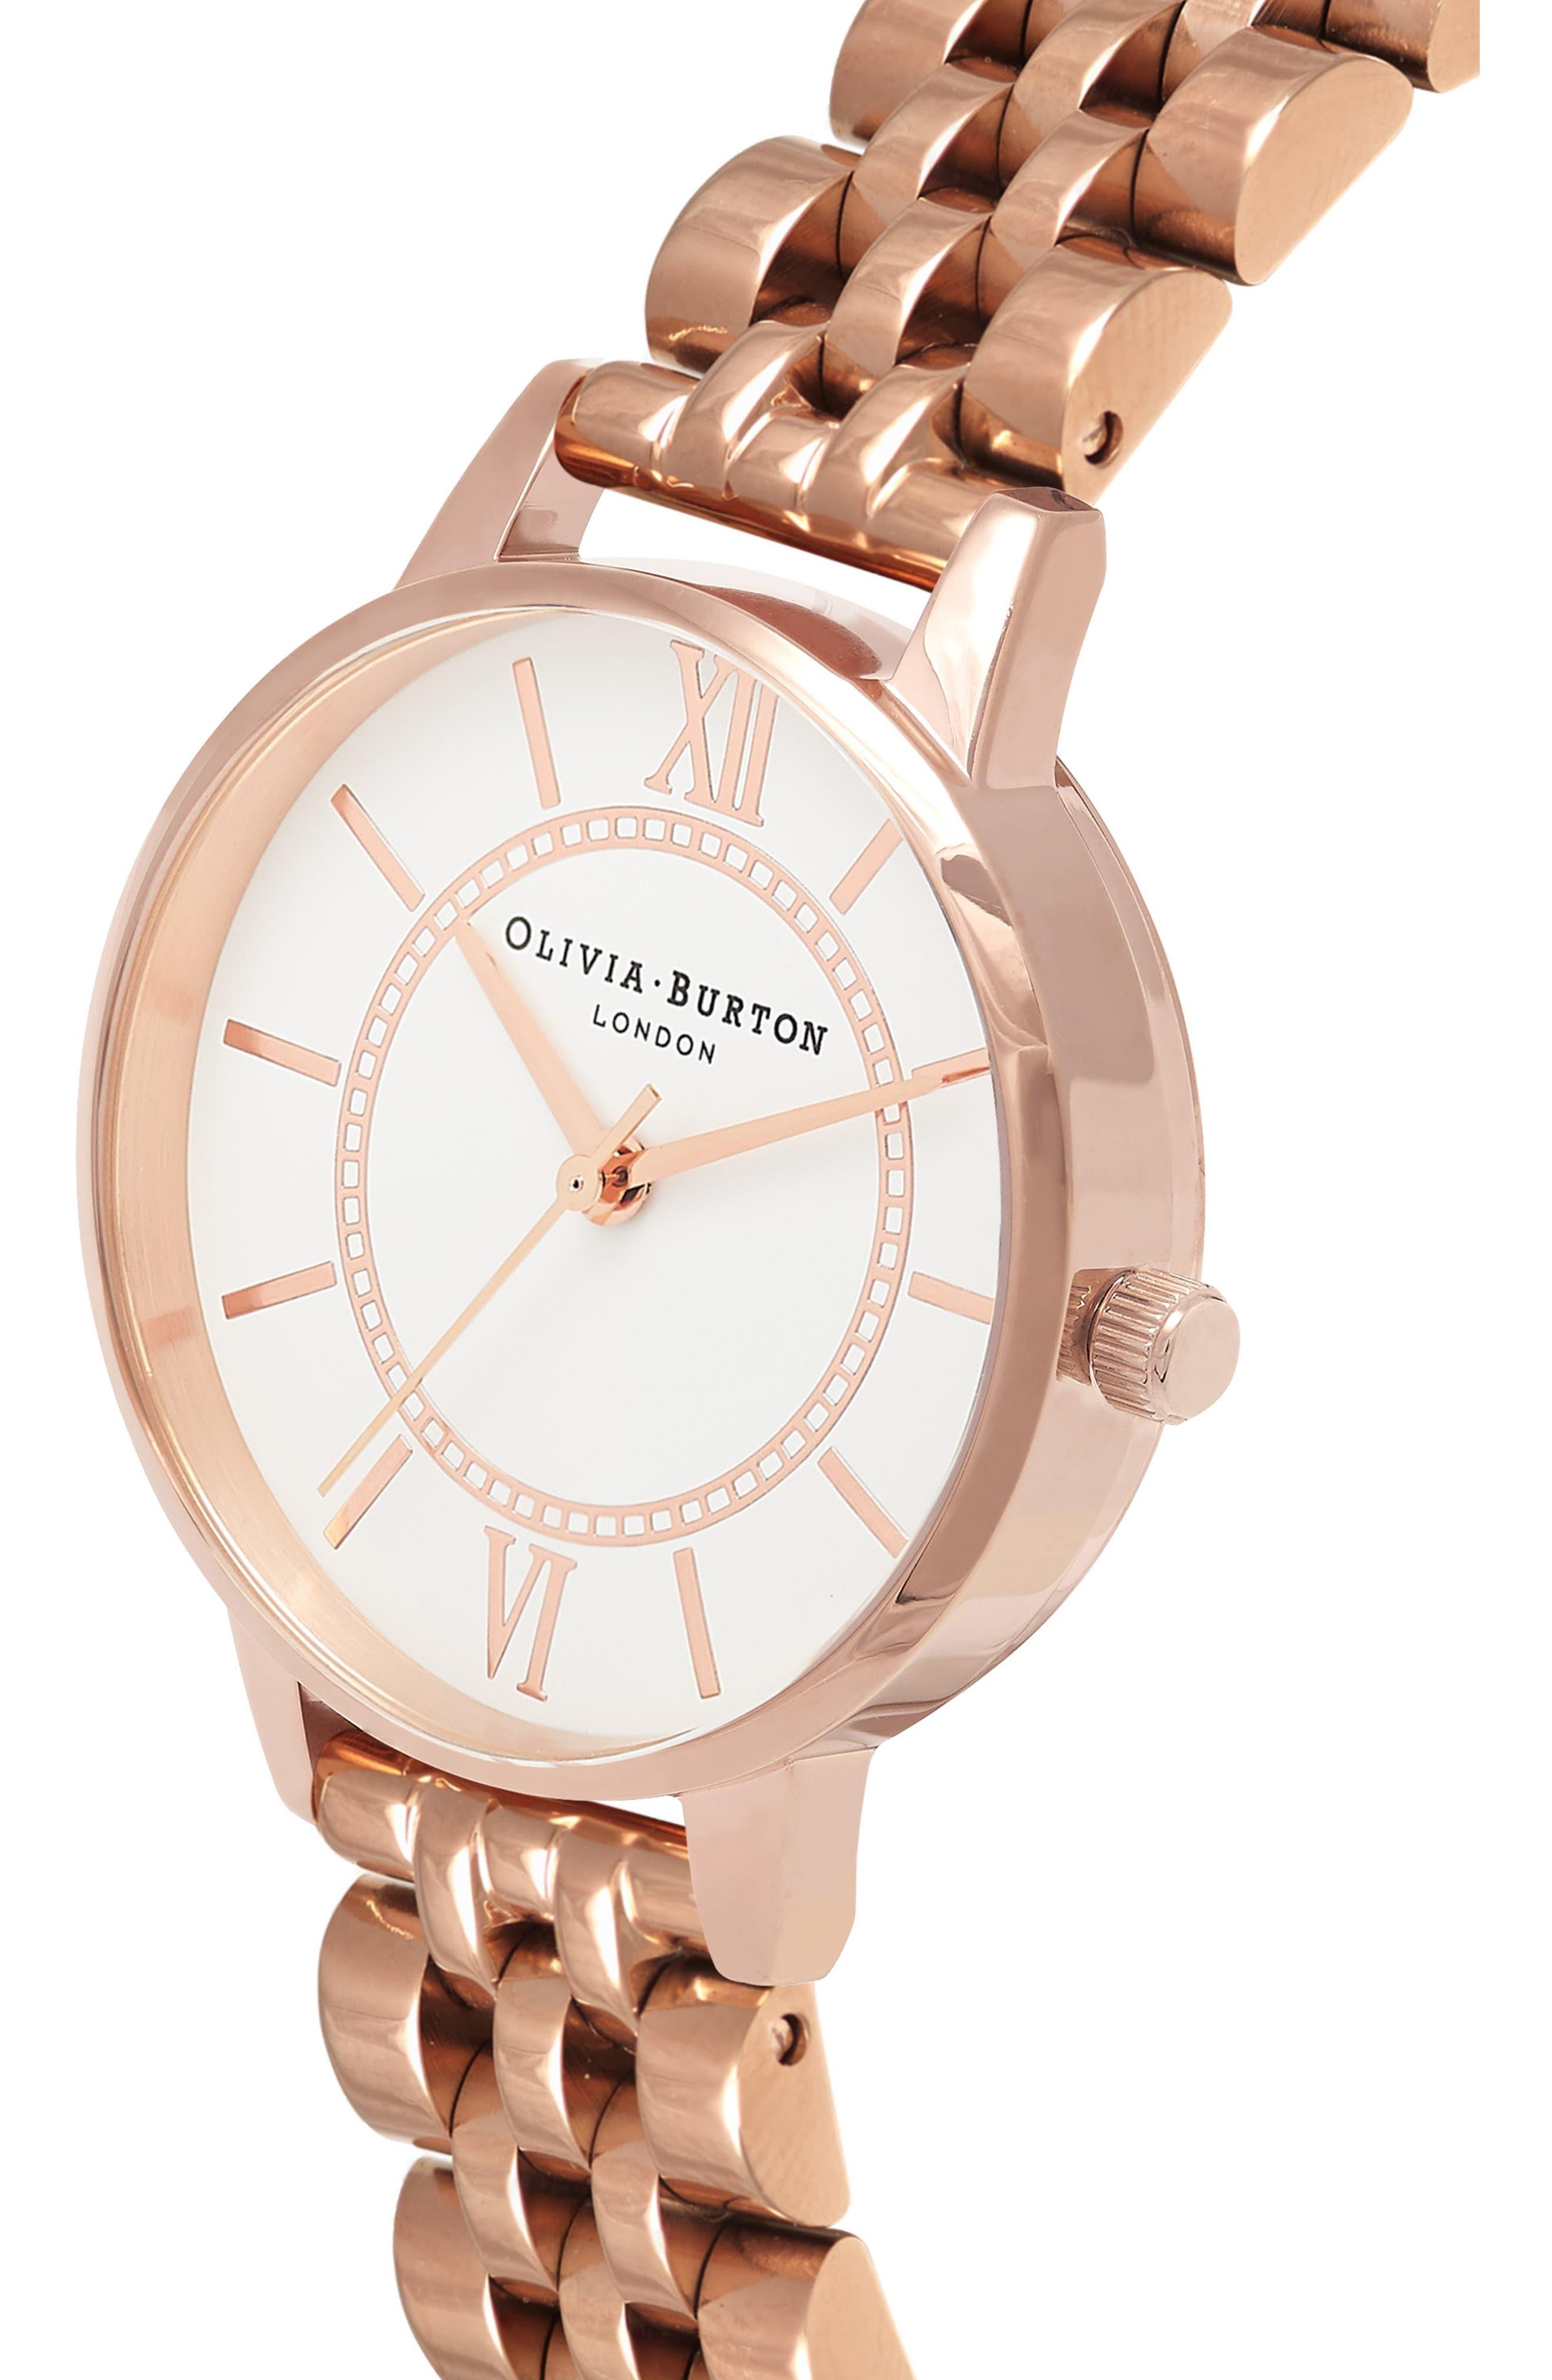 OLIVIA BURTON,                             Wonderland Bracelet Watch, 30mm,                             Alternate thumbnail 4, color,                             ROSE GOLD/ HITE/ ROSE GOLD